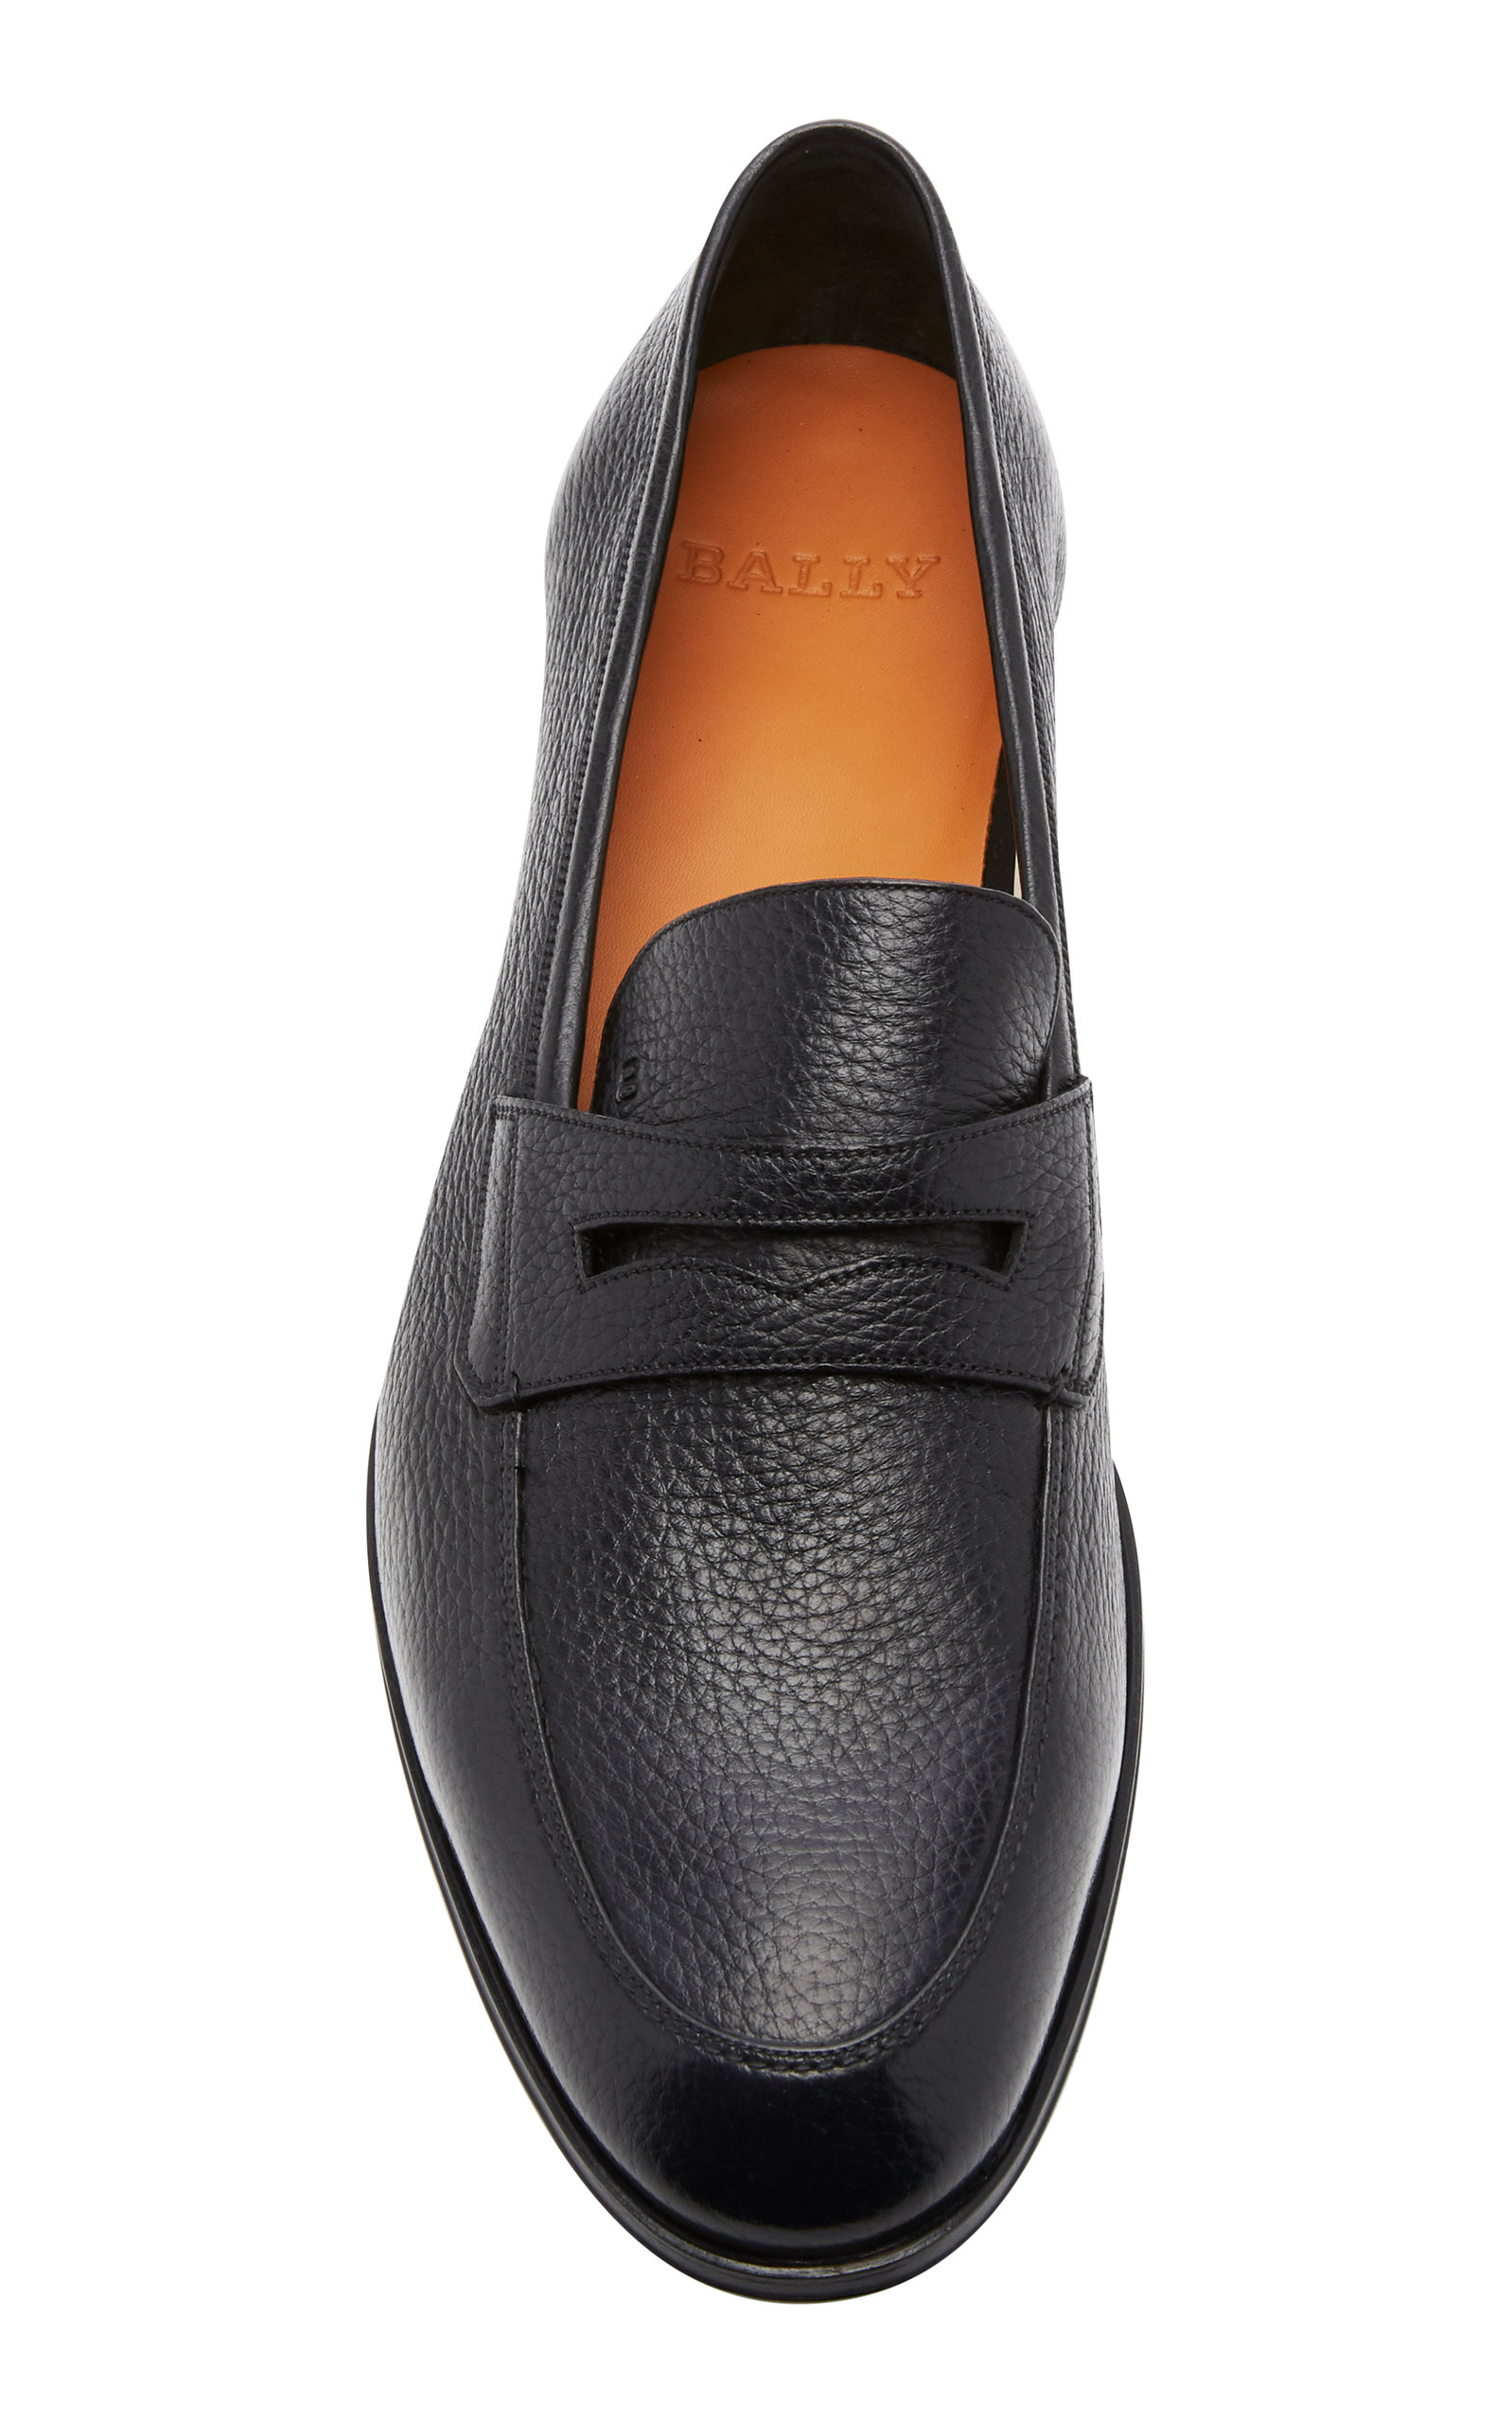 13f102ae755 BallyWebb Leather Penny Loafers. CLOSE. Loading. Loading. Loading